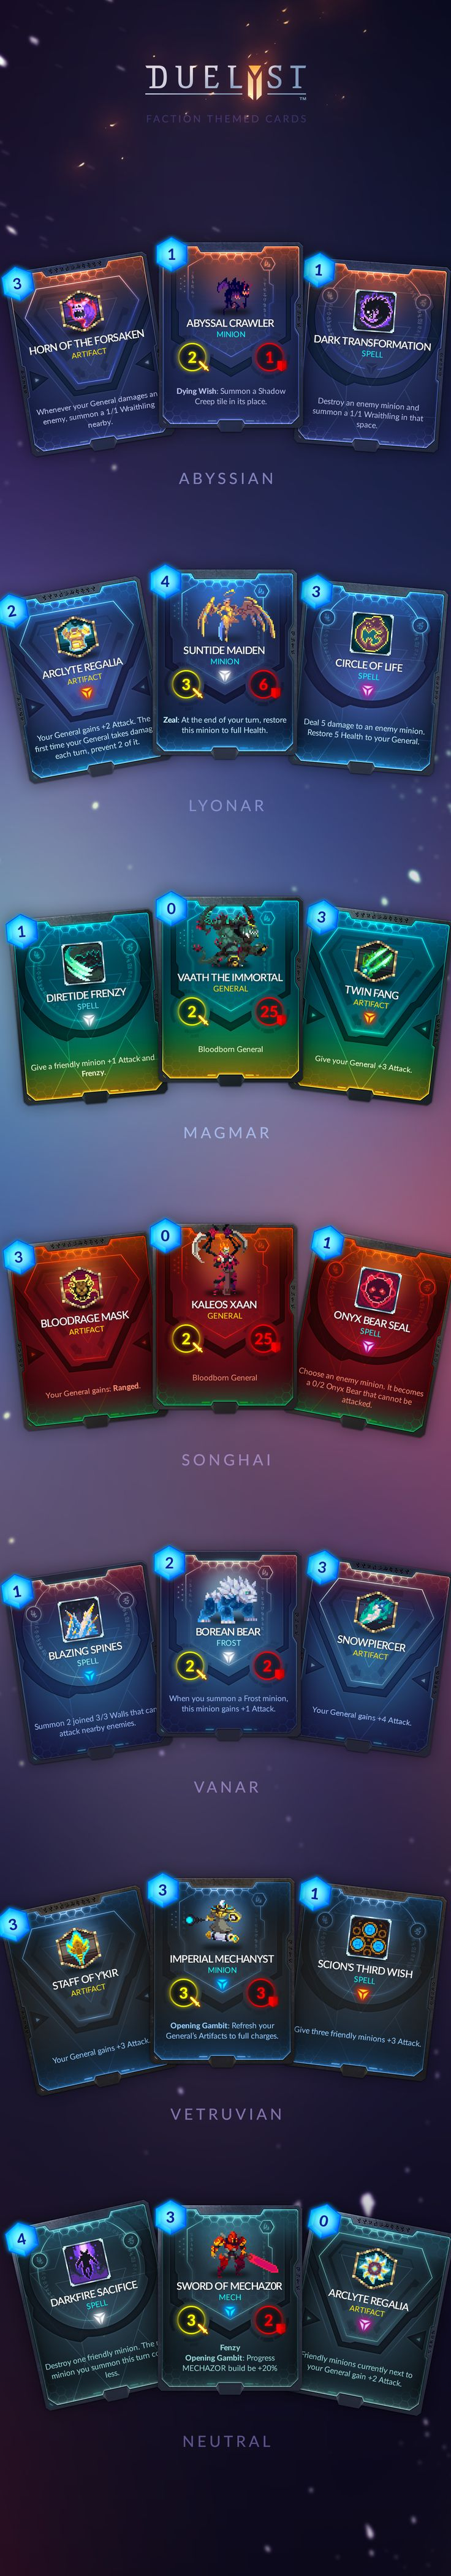 Duelyst Cards on Behance